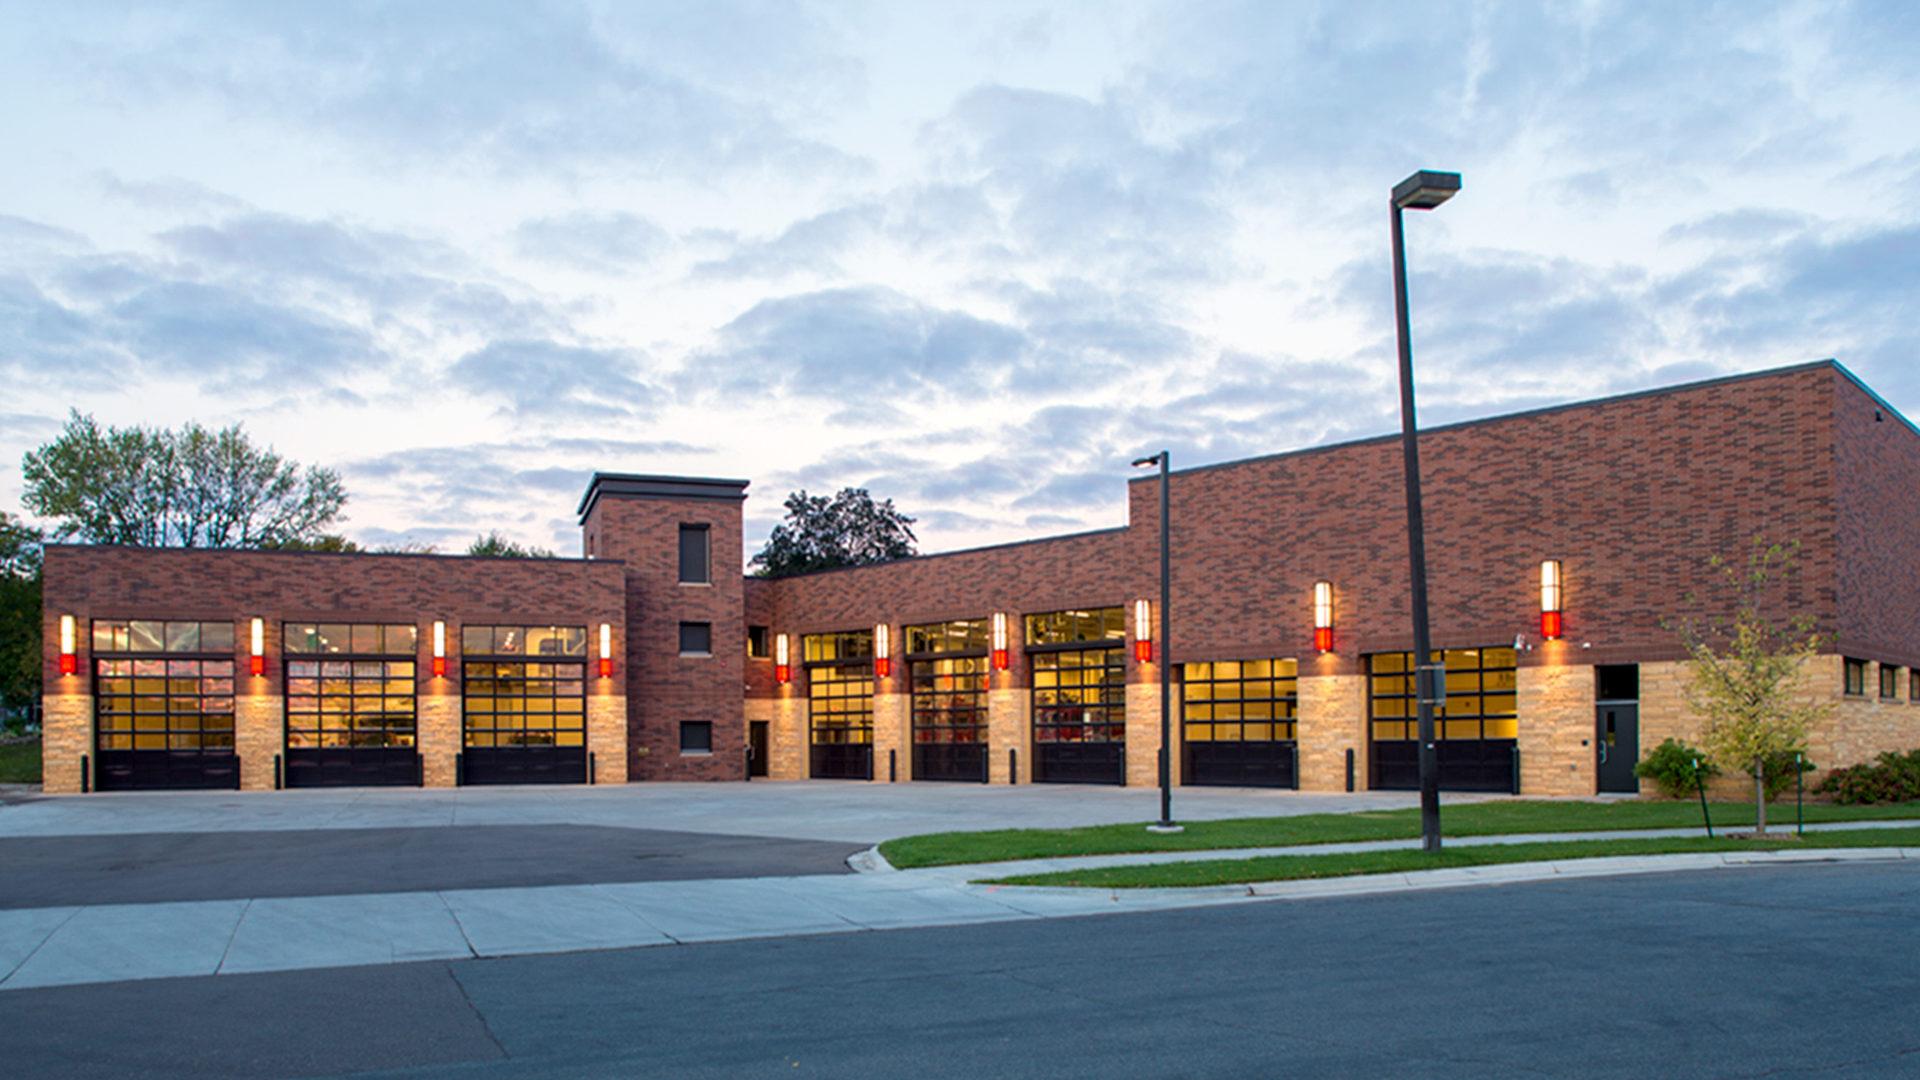 St Louis Park Fire Station 1 St Louis Park MN Exterior Fire Vehicle Banks Night View